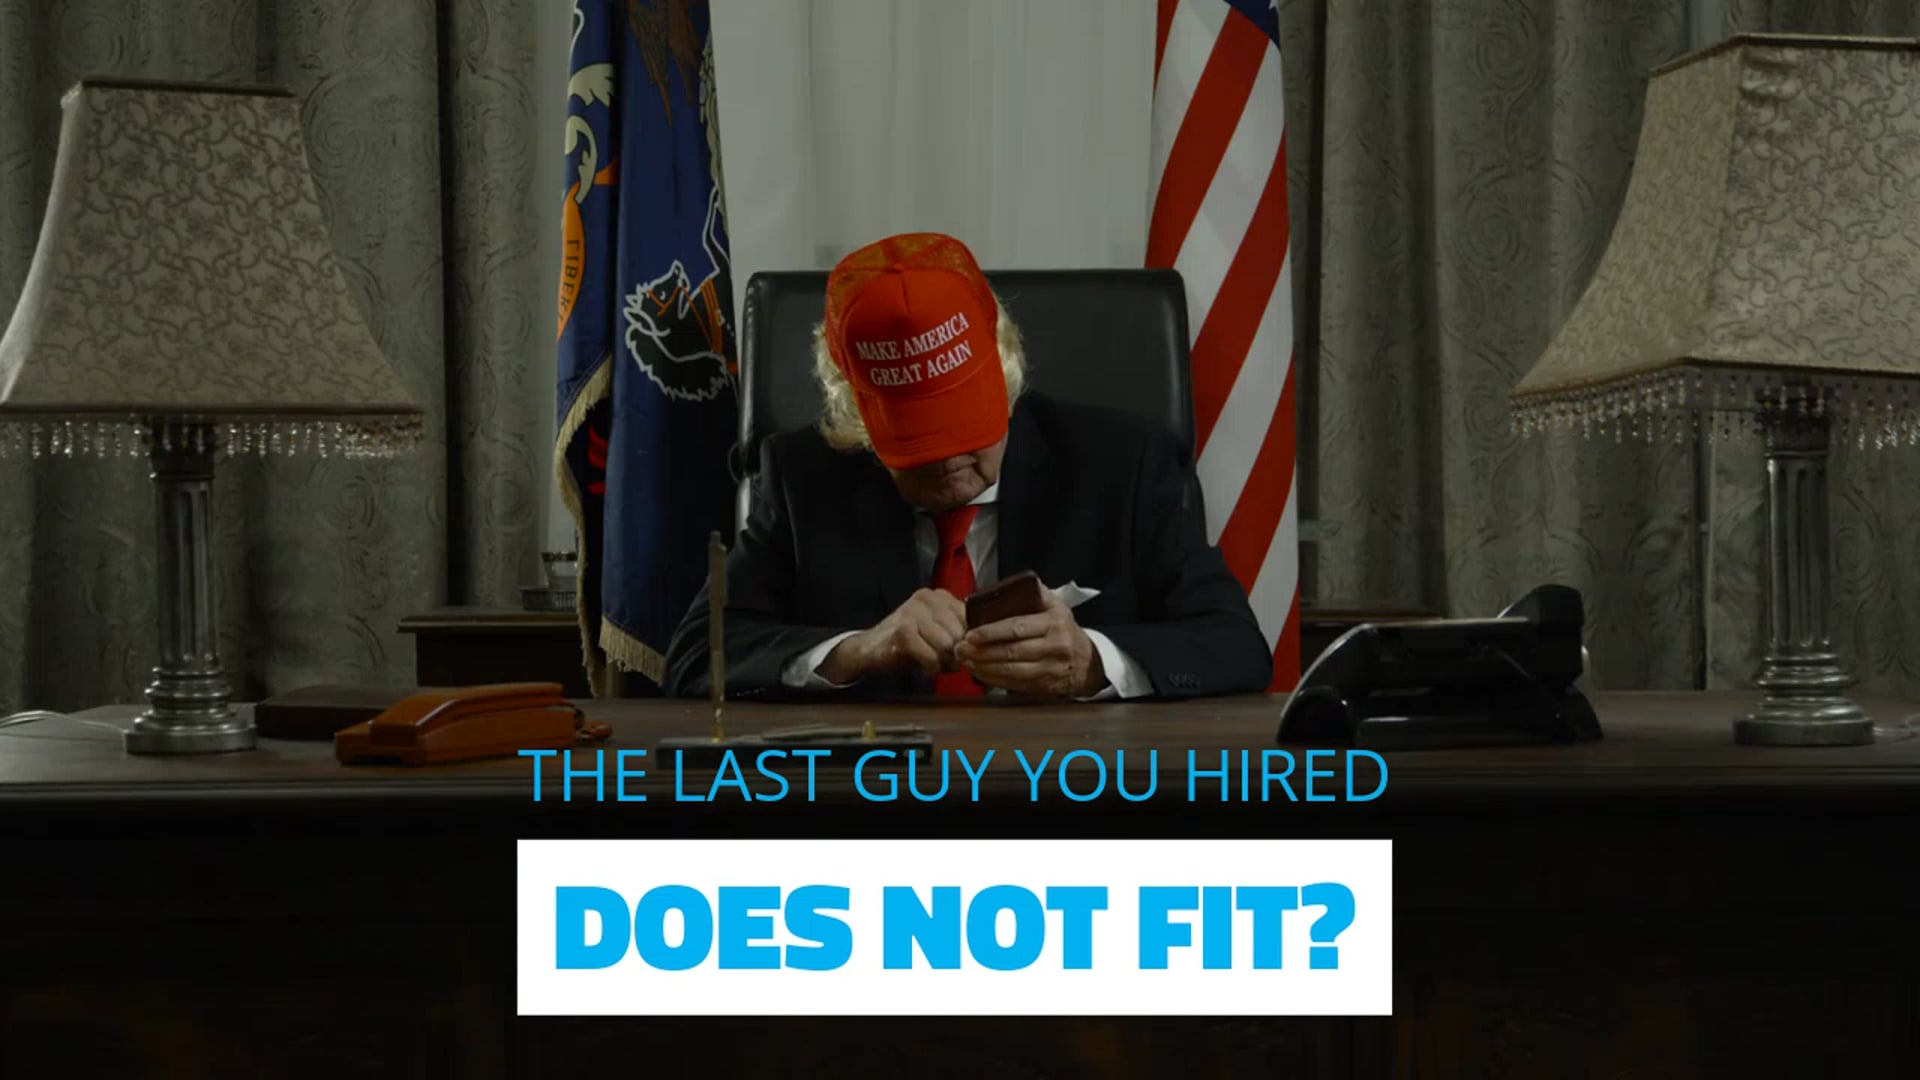 Make recruitment great again